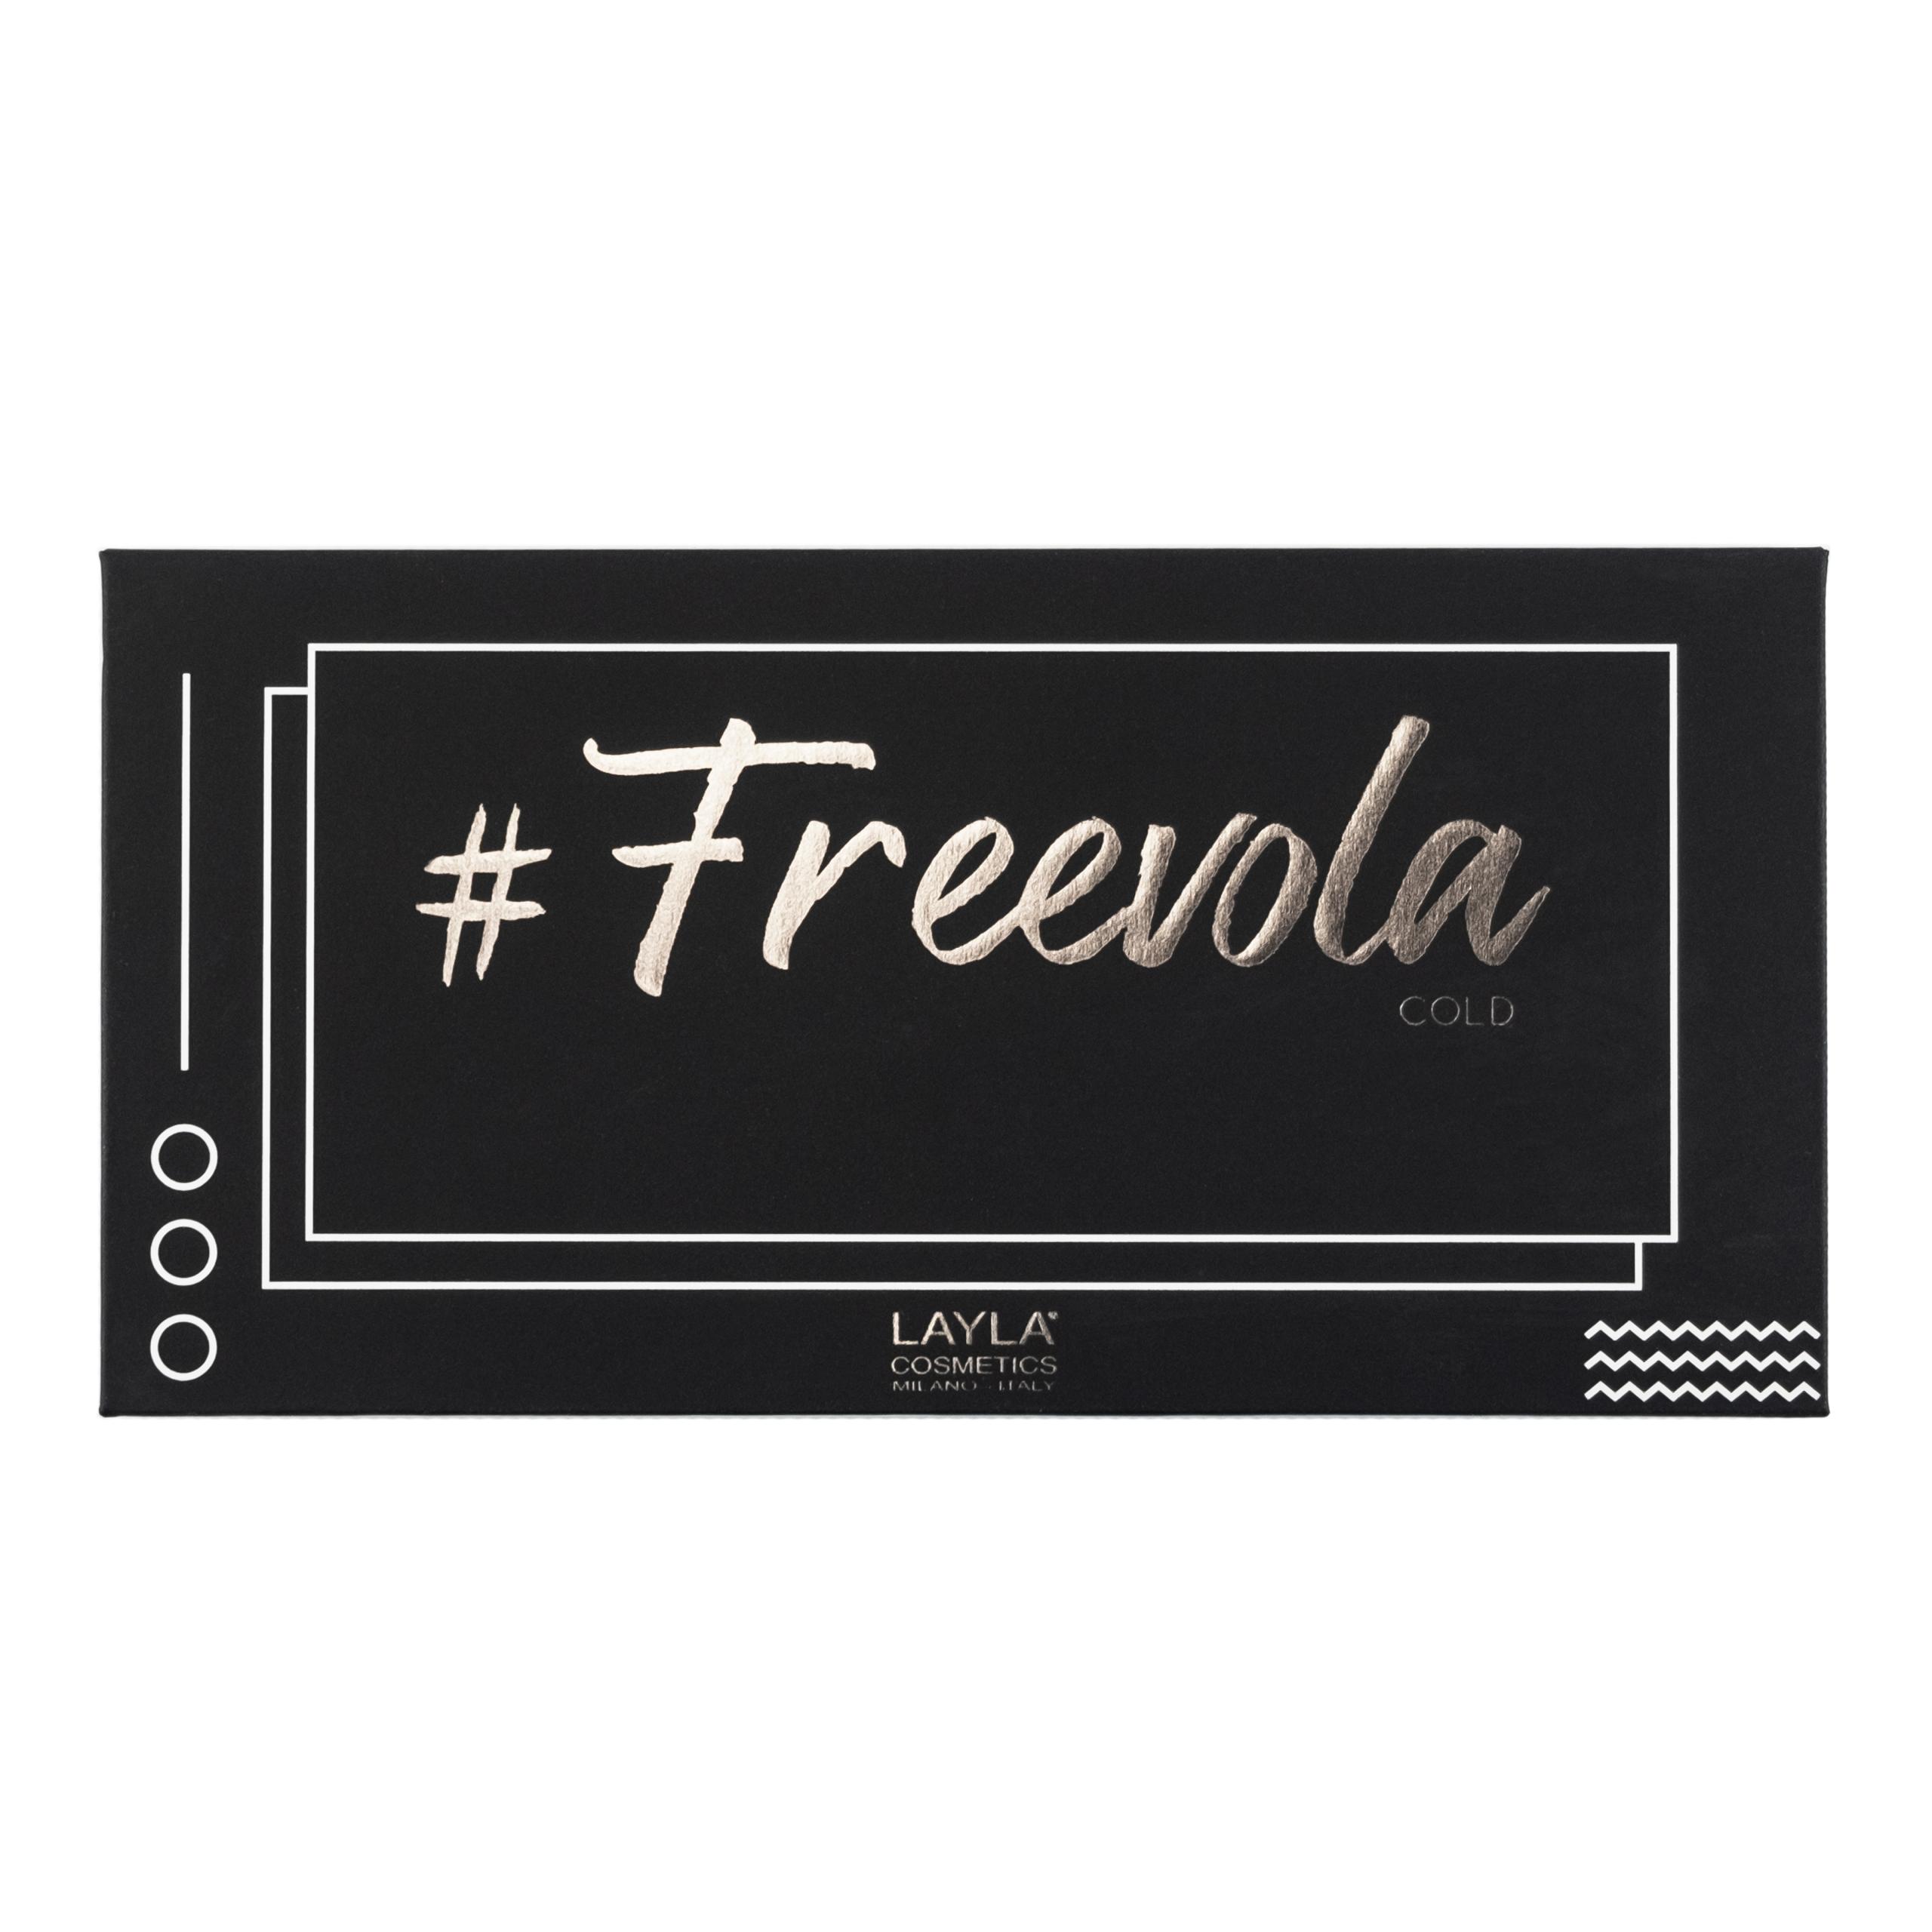 freevola palette layla cosmetics